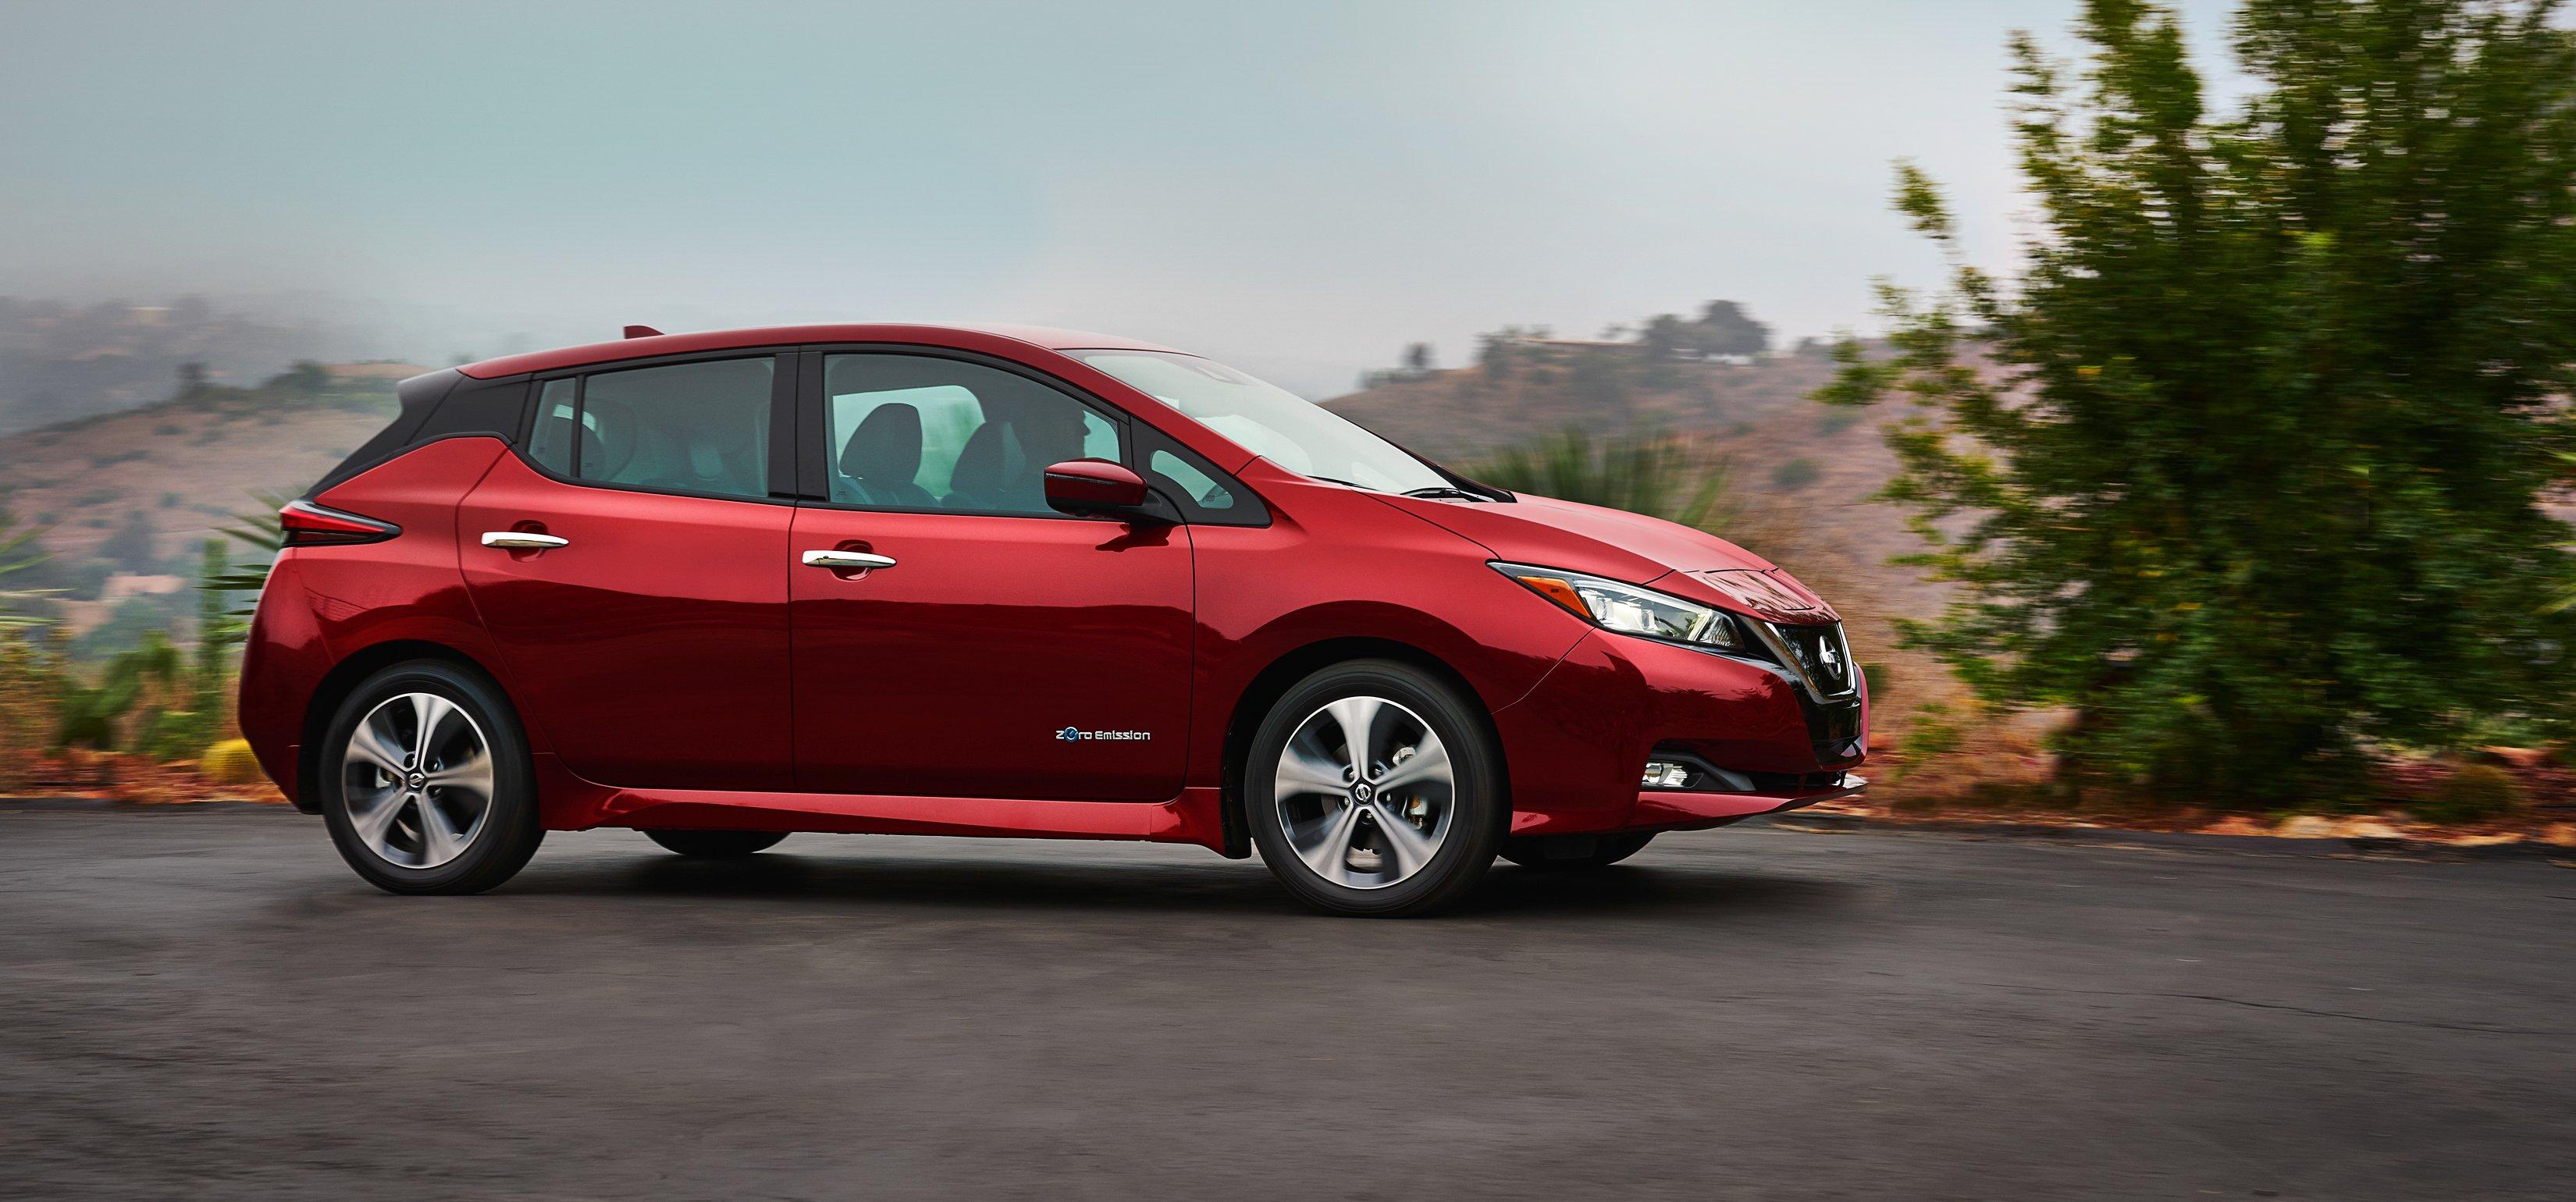 2018 Nissan Leaf Adds Range, Cuts Price